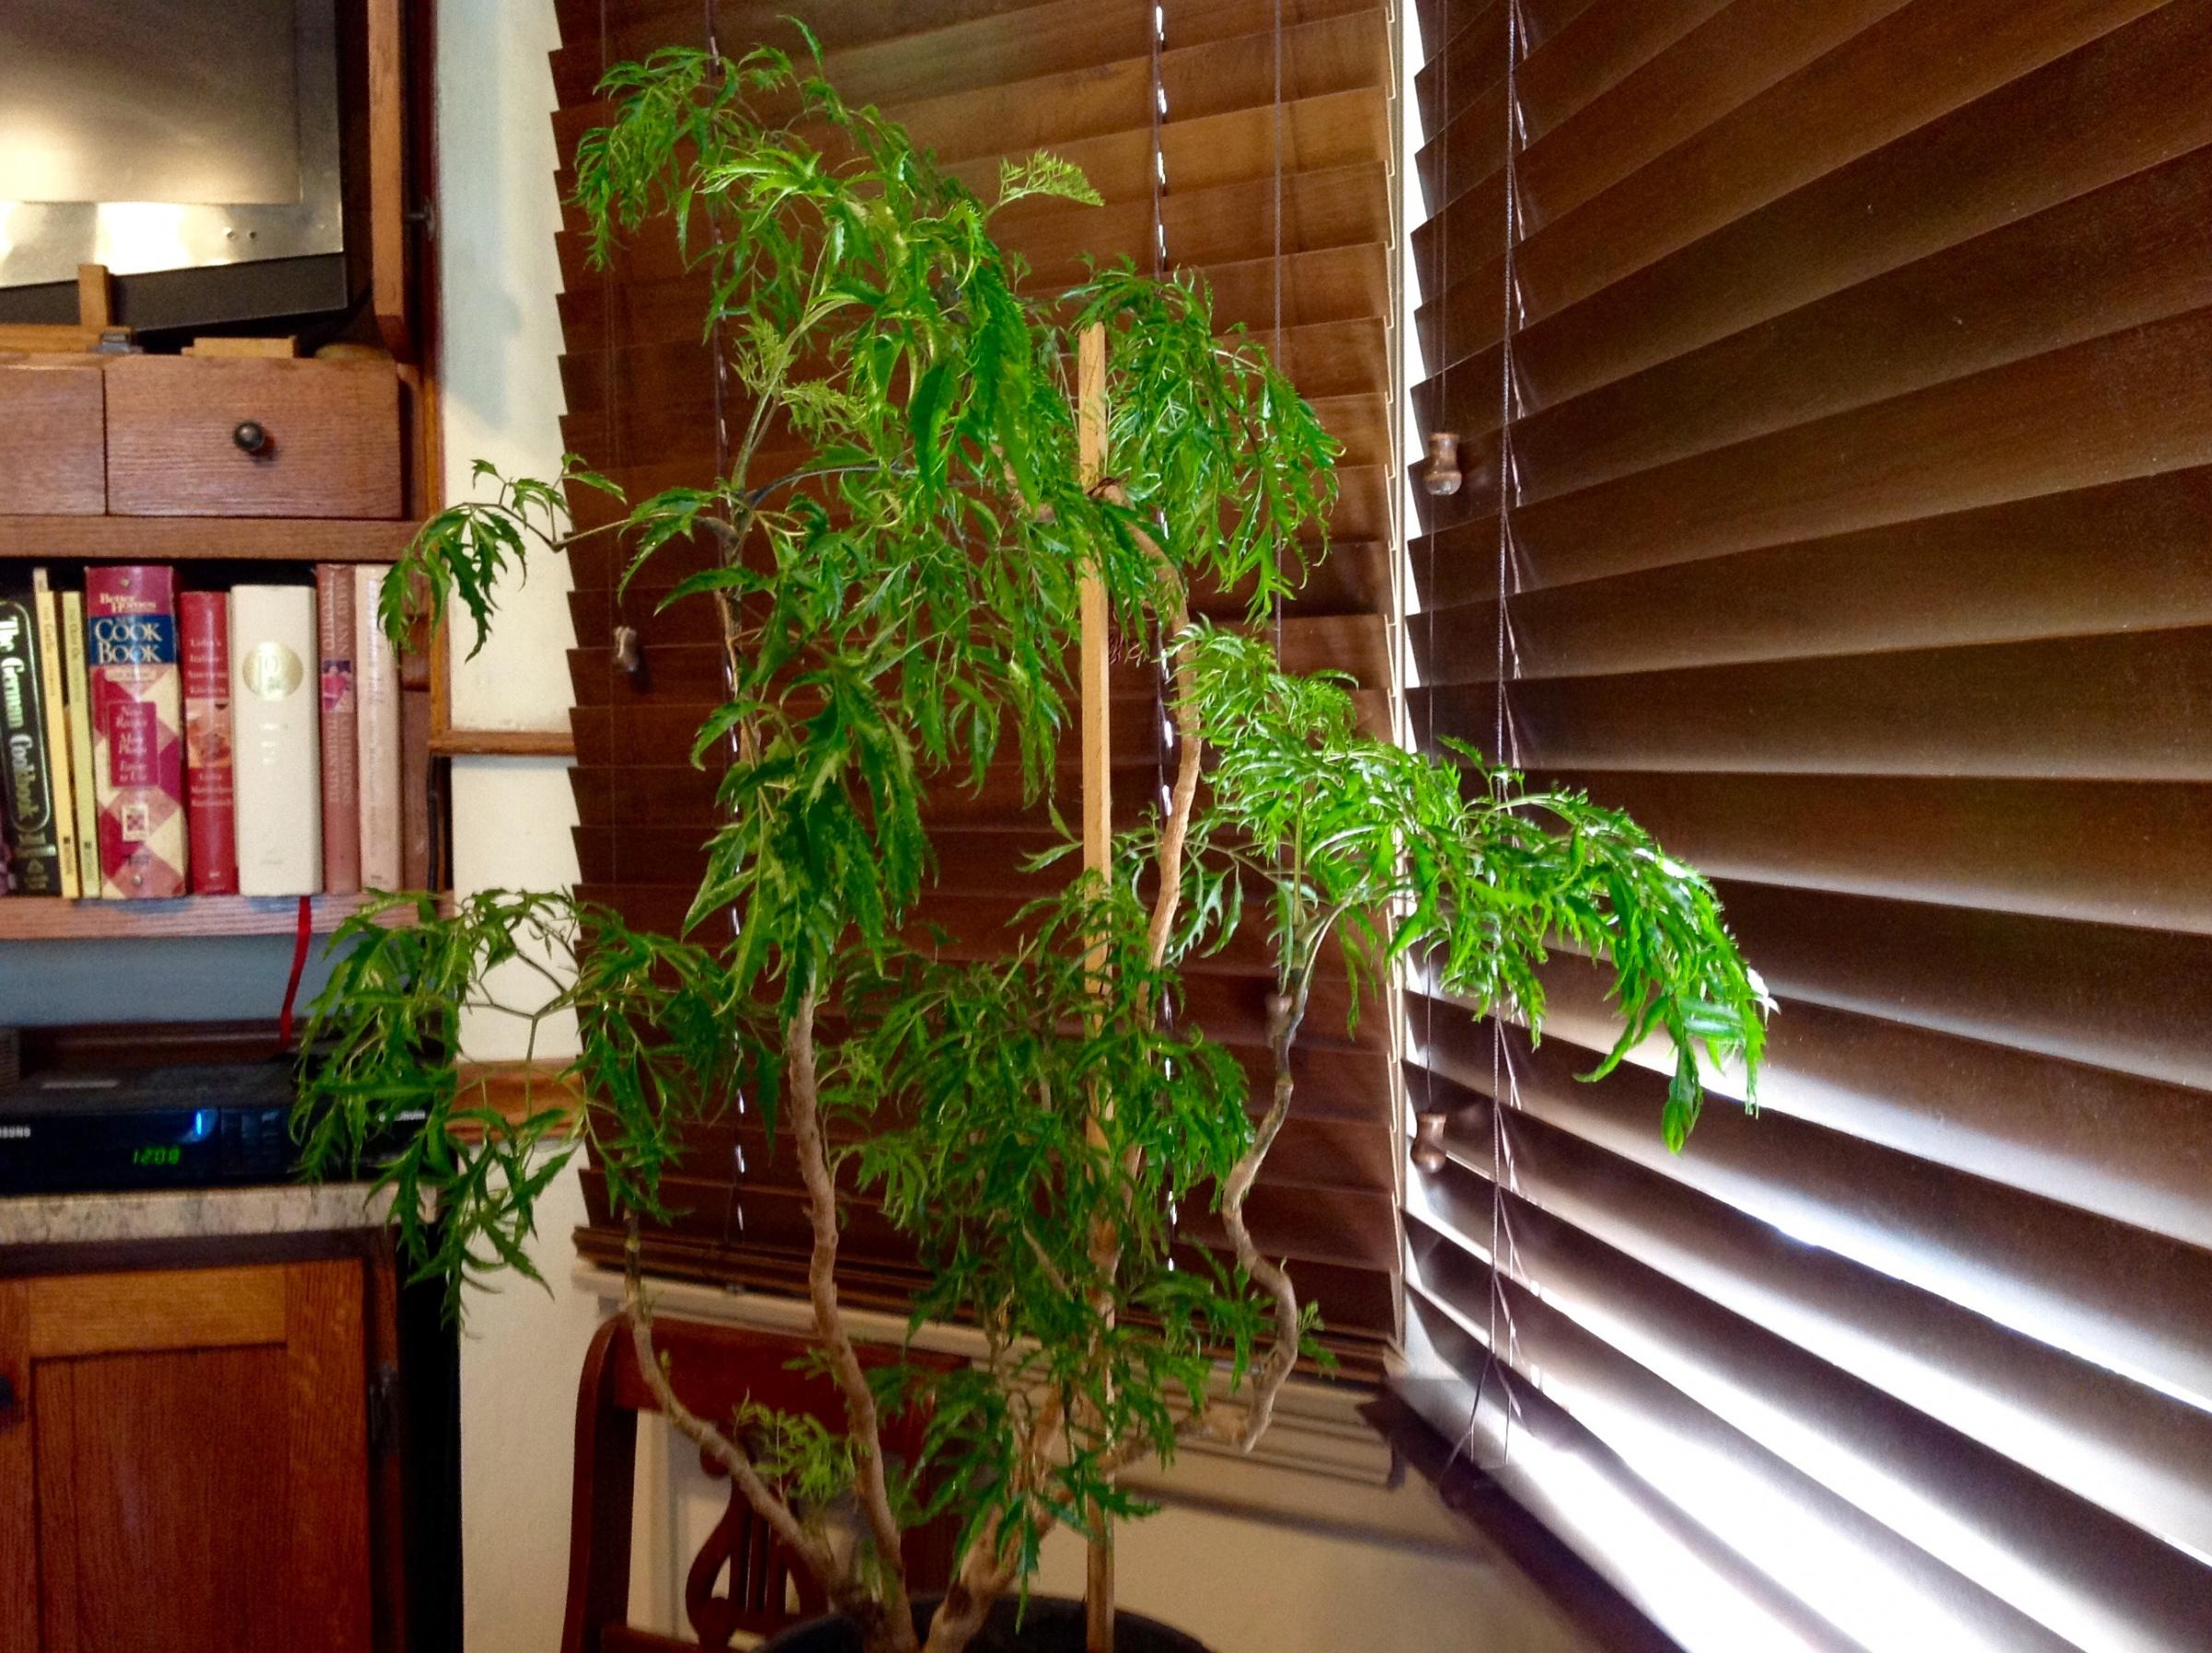 Lemon Tree update-55c4dd15-90e6-450c-a102-eea7dff917ca.jpg